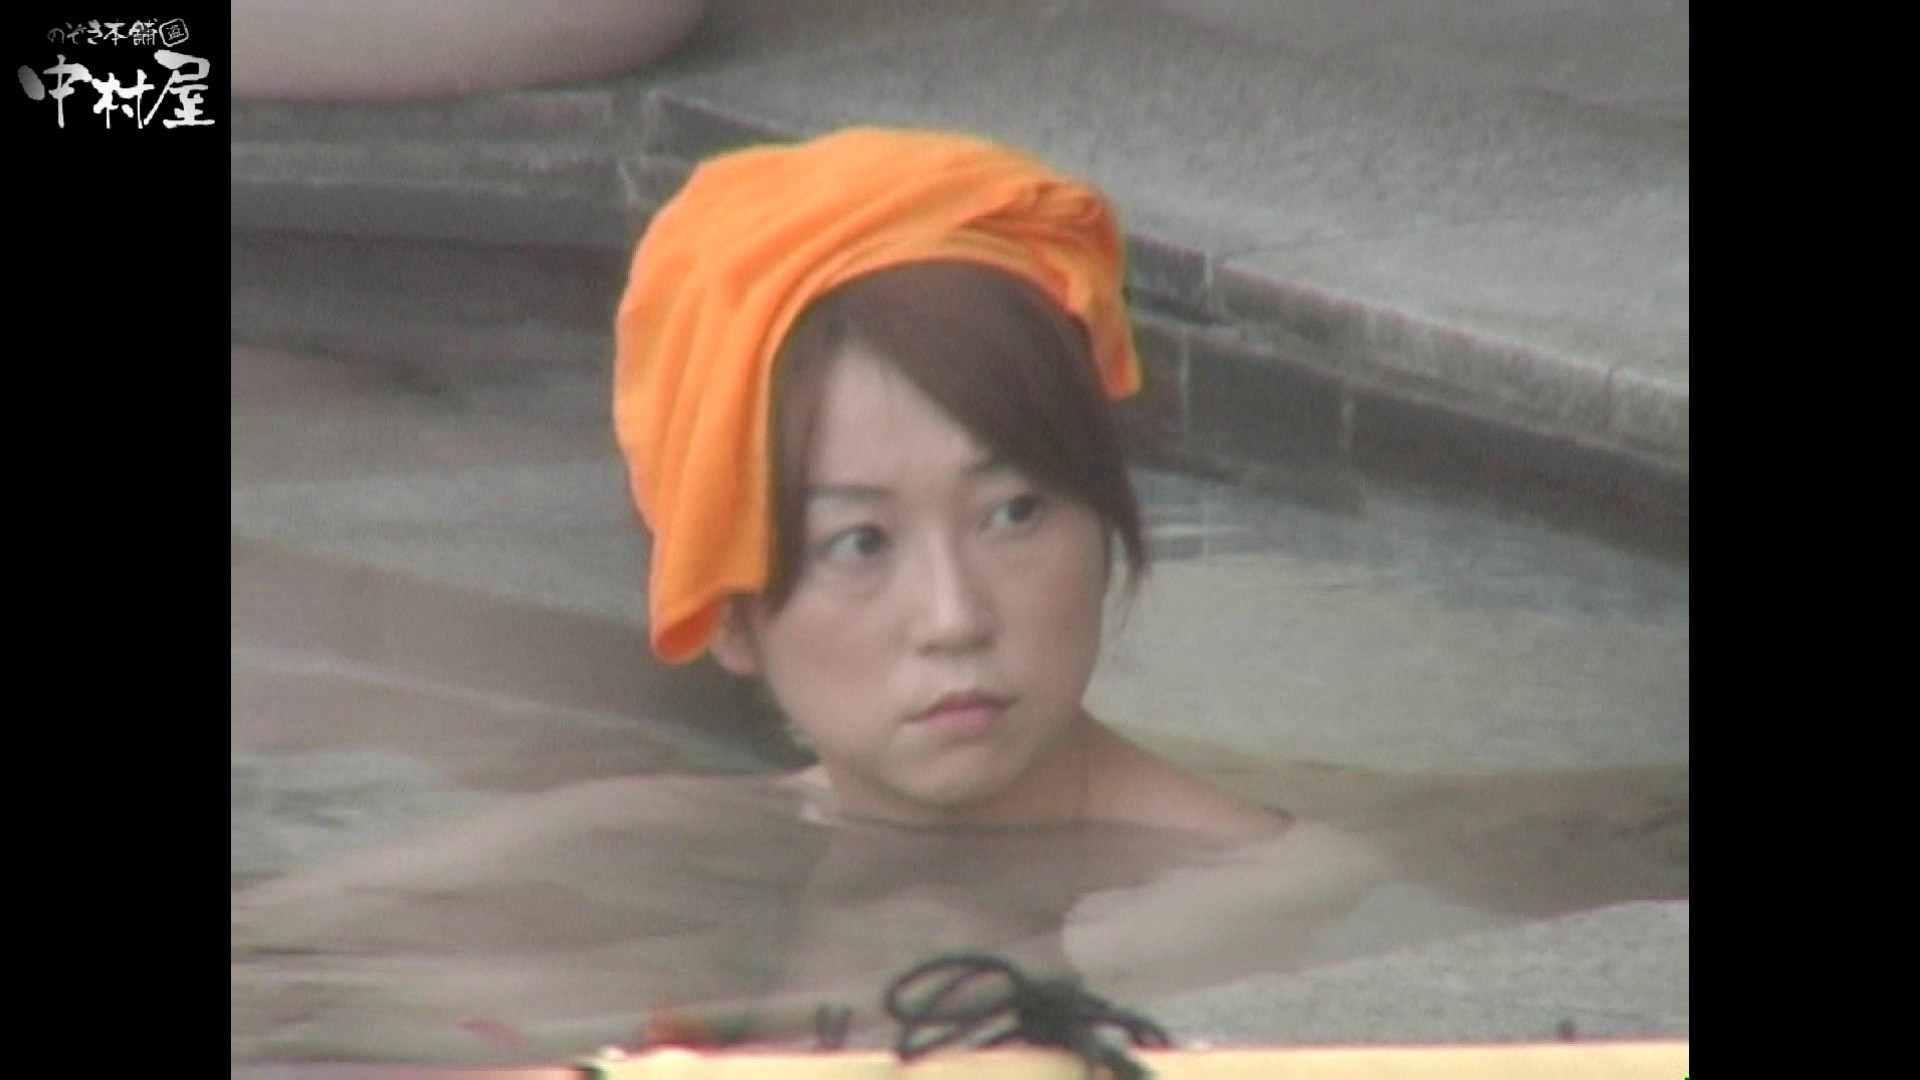 Aquaな露天風呂Vol.941 OLセックス  49画像 30